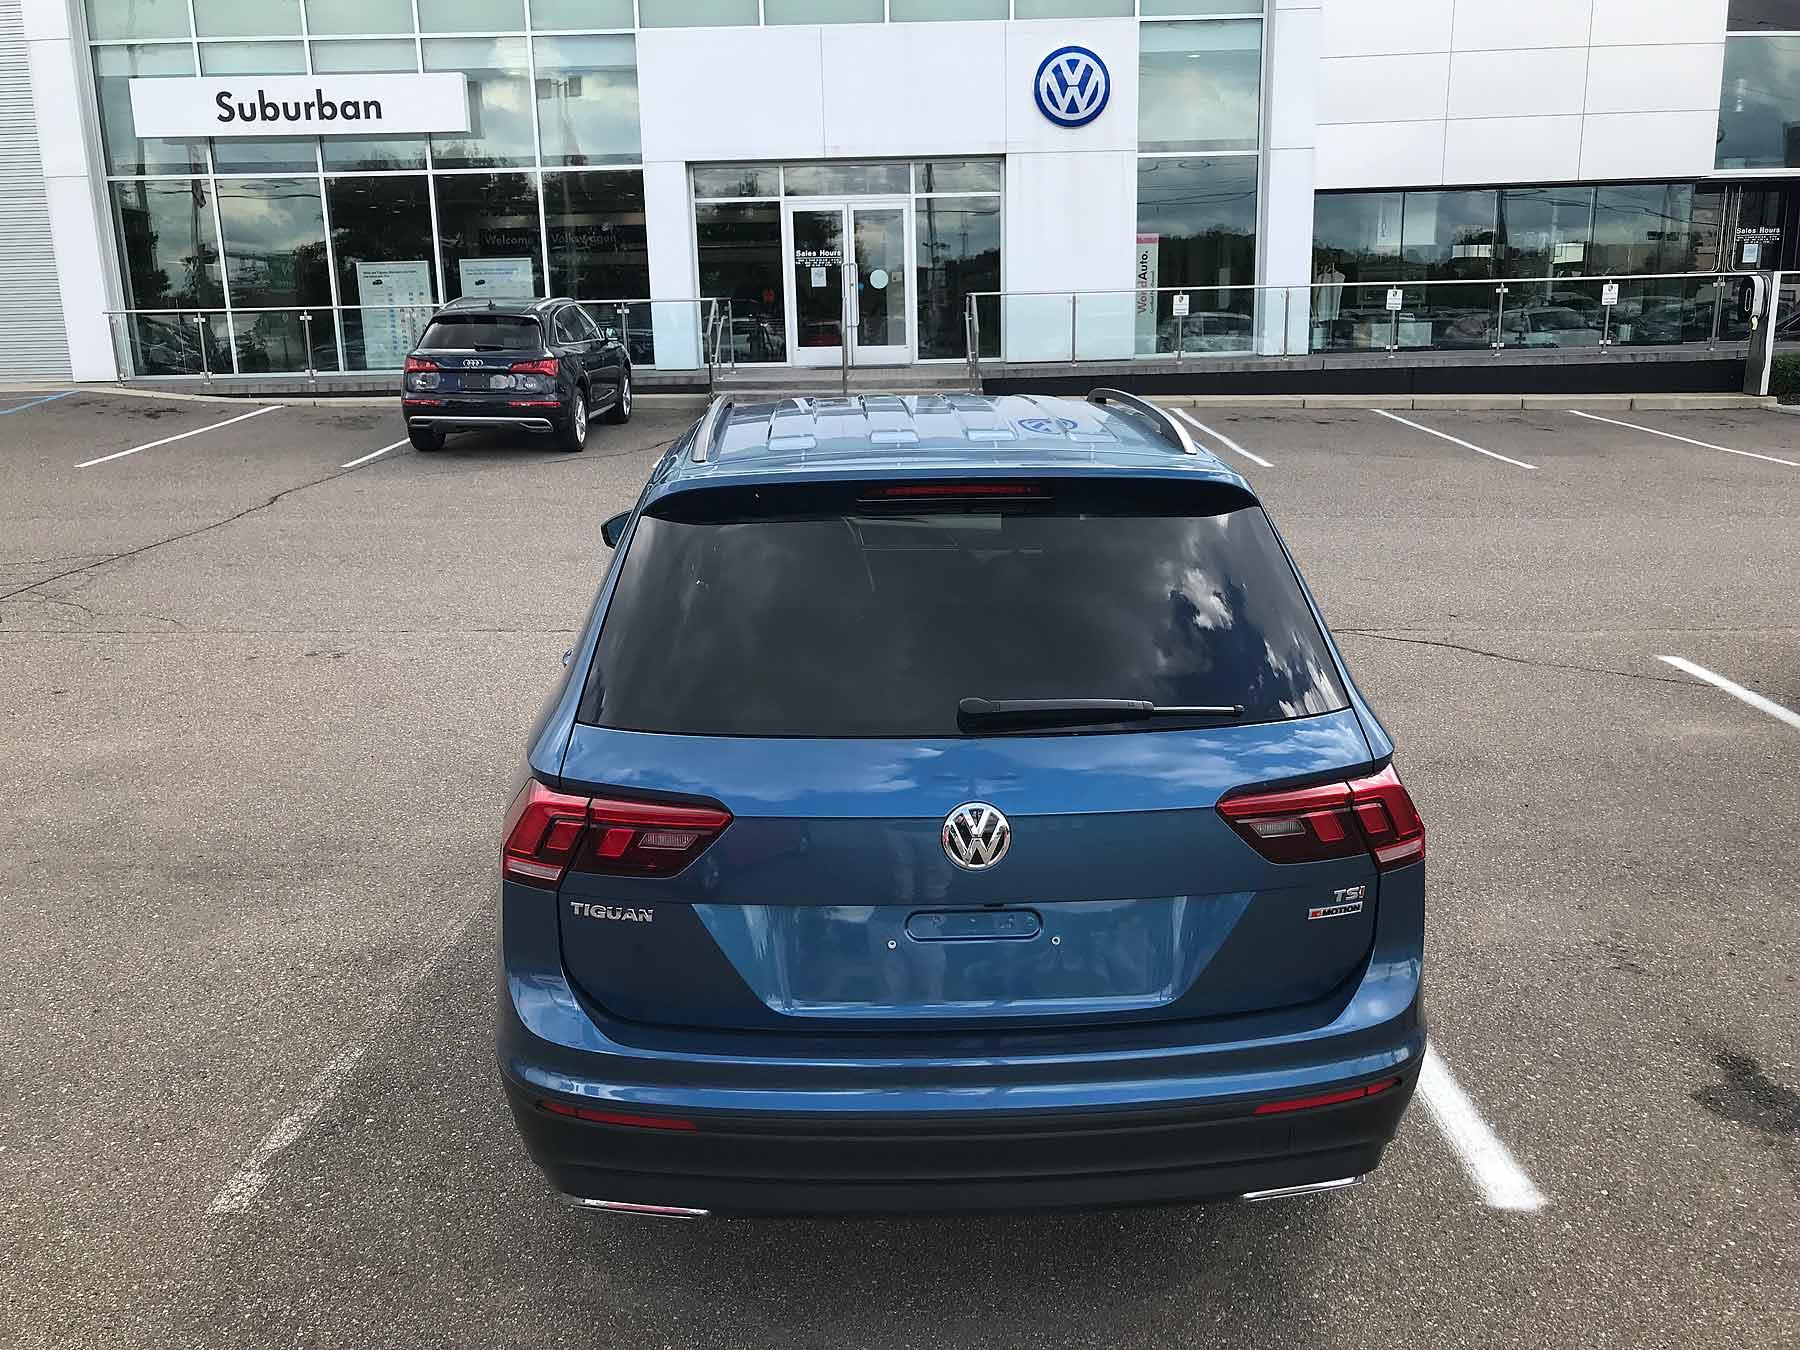 U S October 2018 Volkswagen Audi Auto Sales Audi S Nearly 9 Year